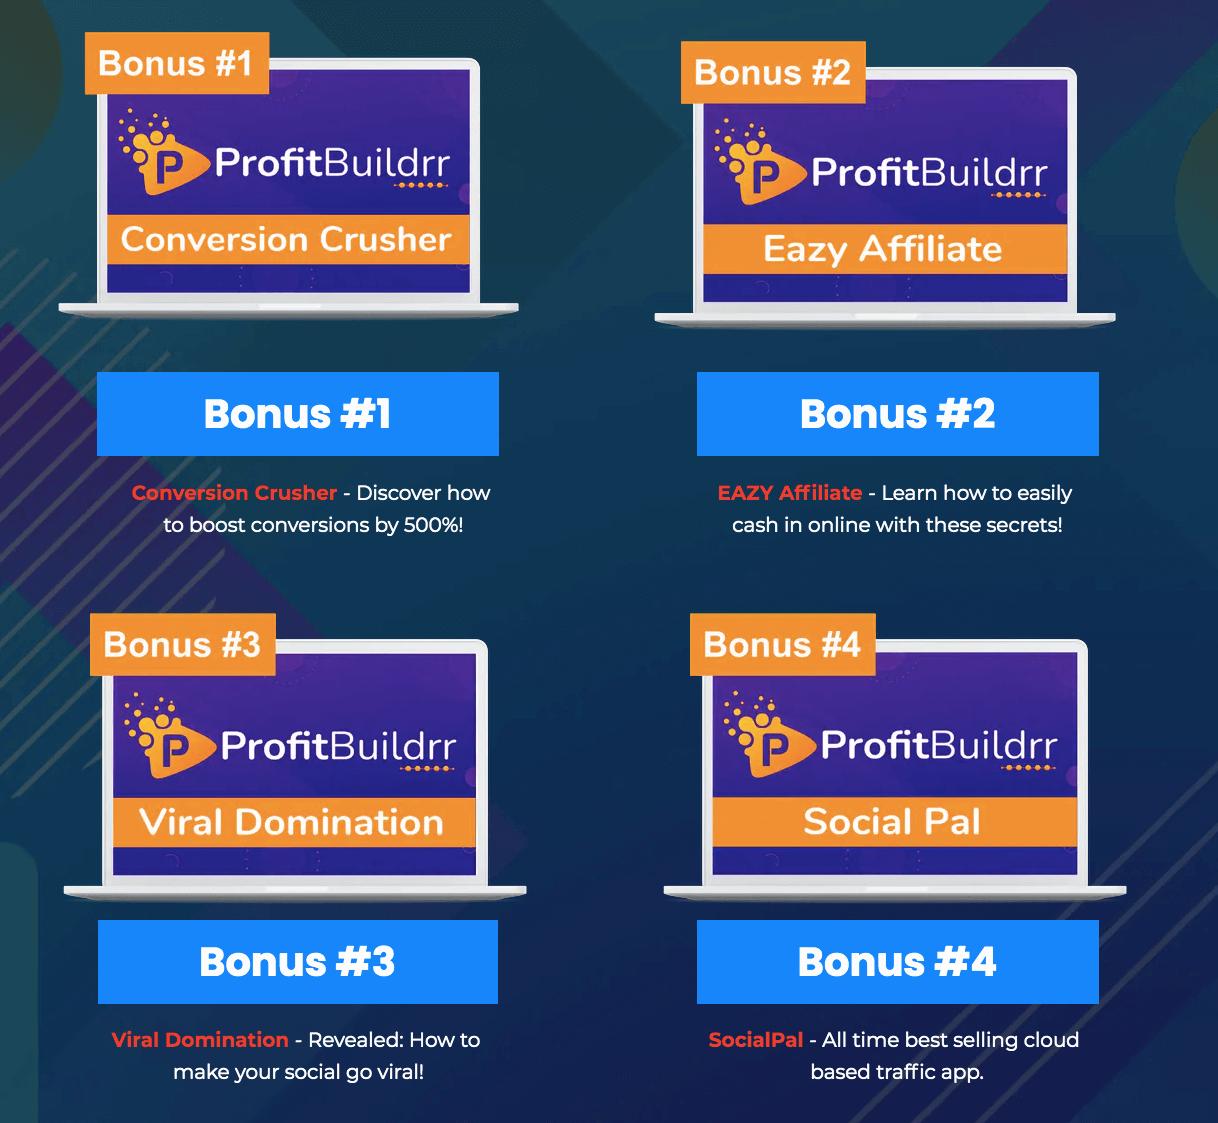 ProfitBuildrr-OTO1-Bonuses